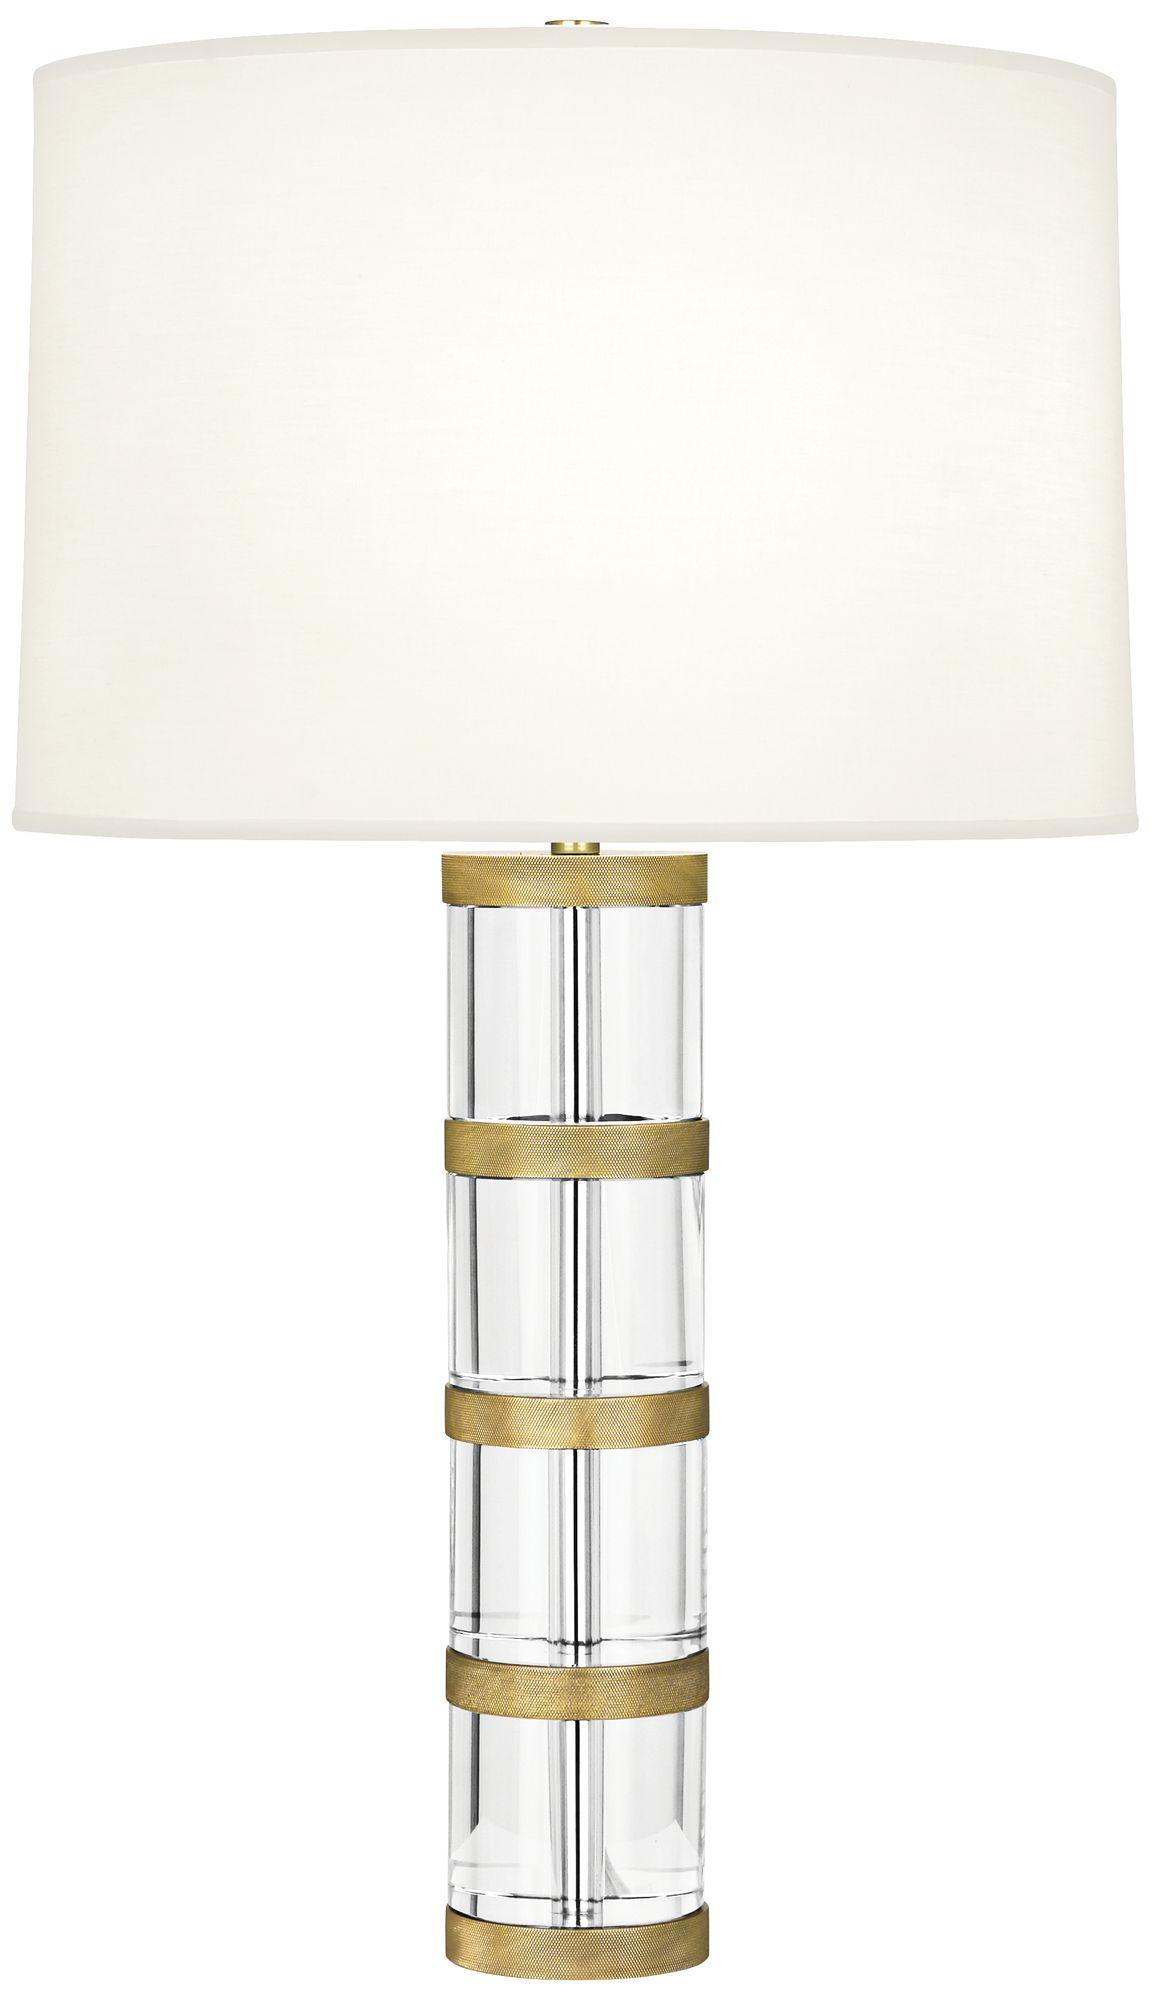 Robert Abbey Wyatt Modern Brass Table Lamp With